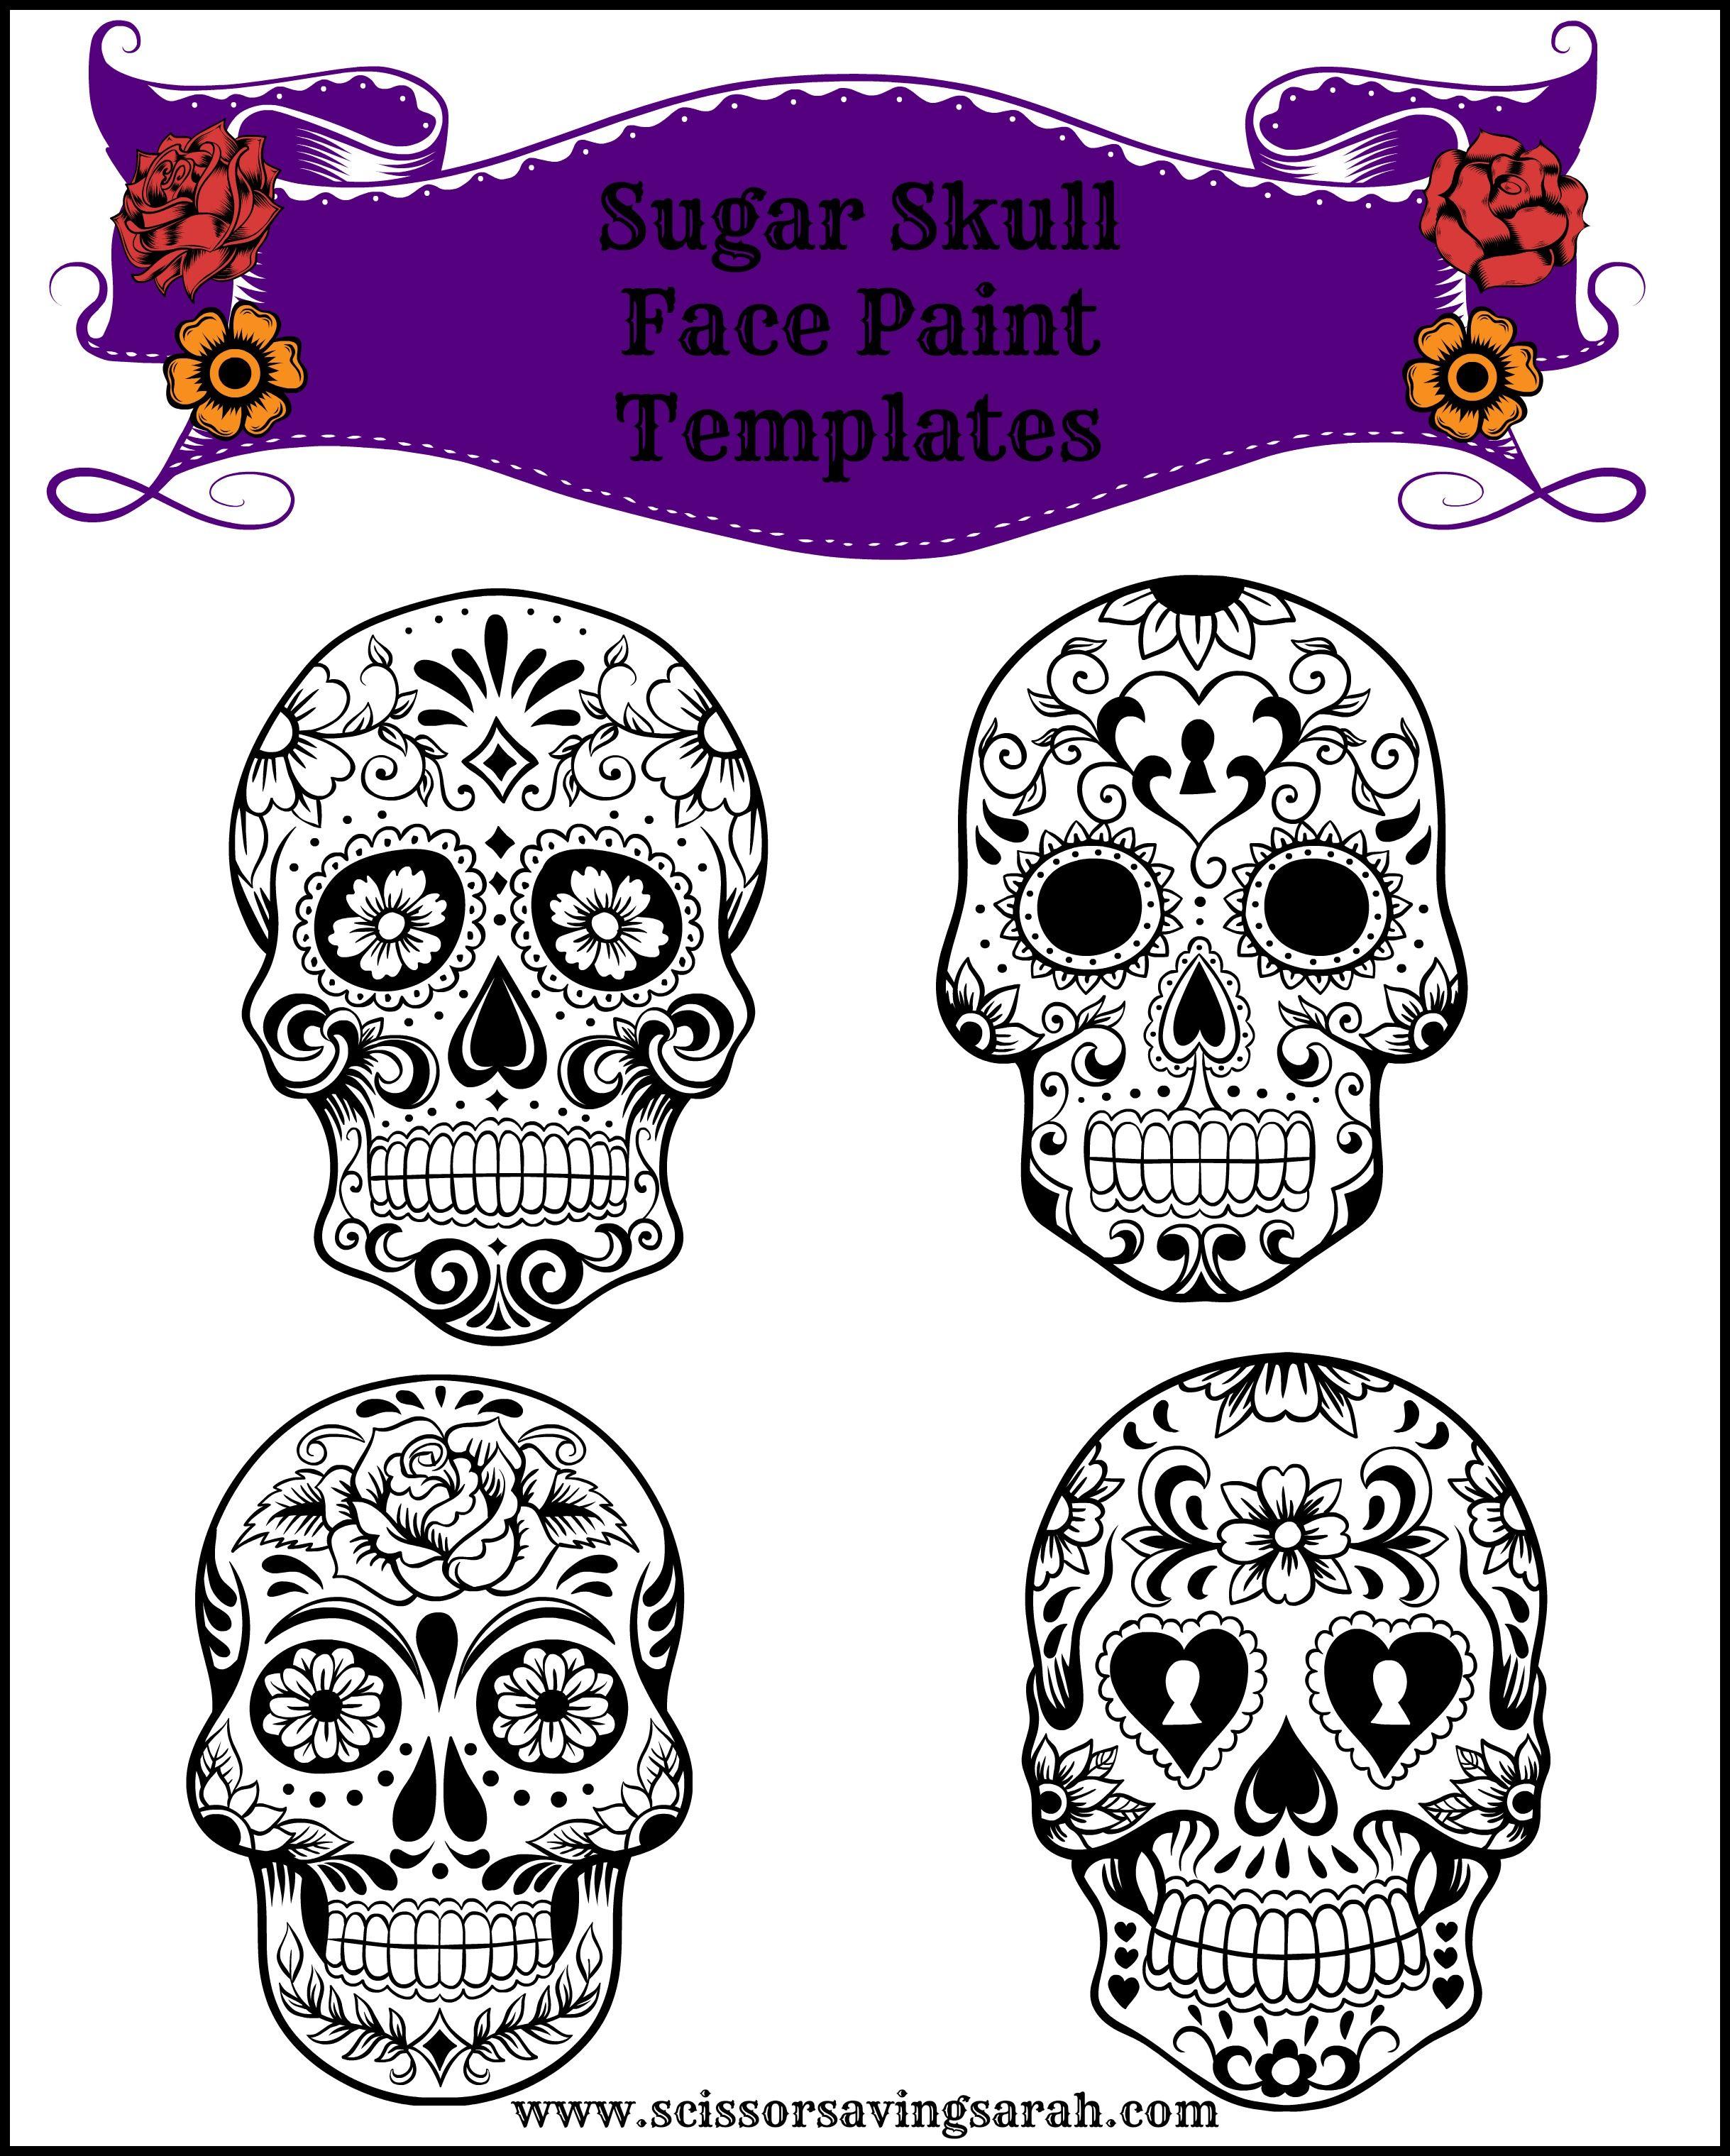 Sugar Skull Face Paint Templates - use any Halloween face paint kit ...